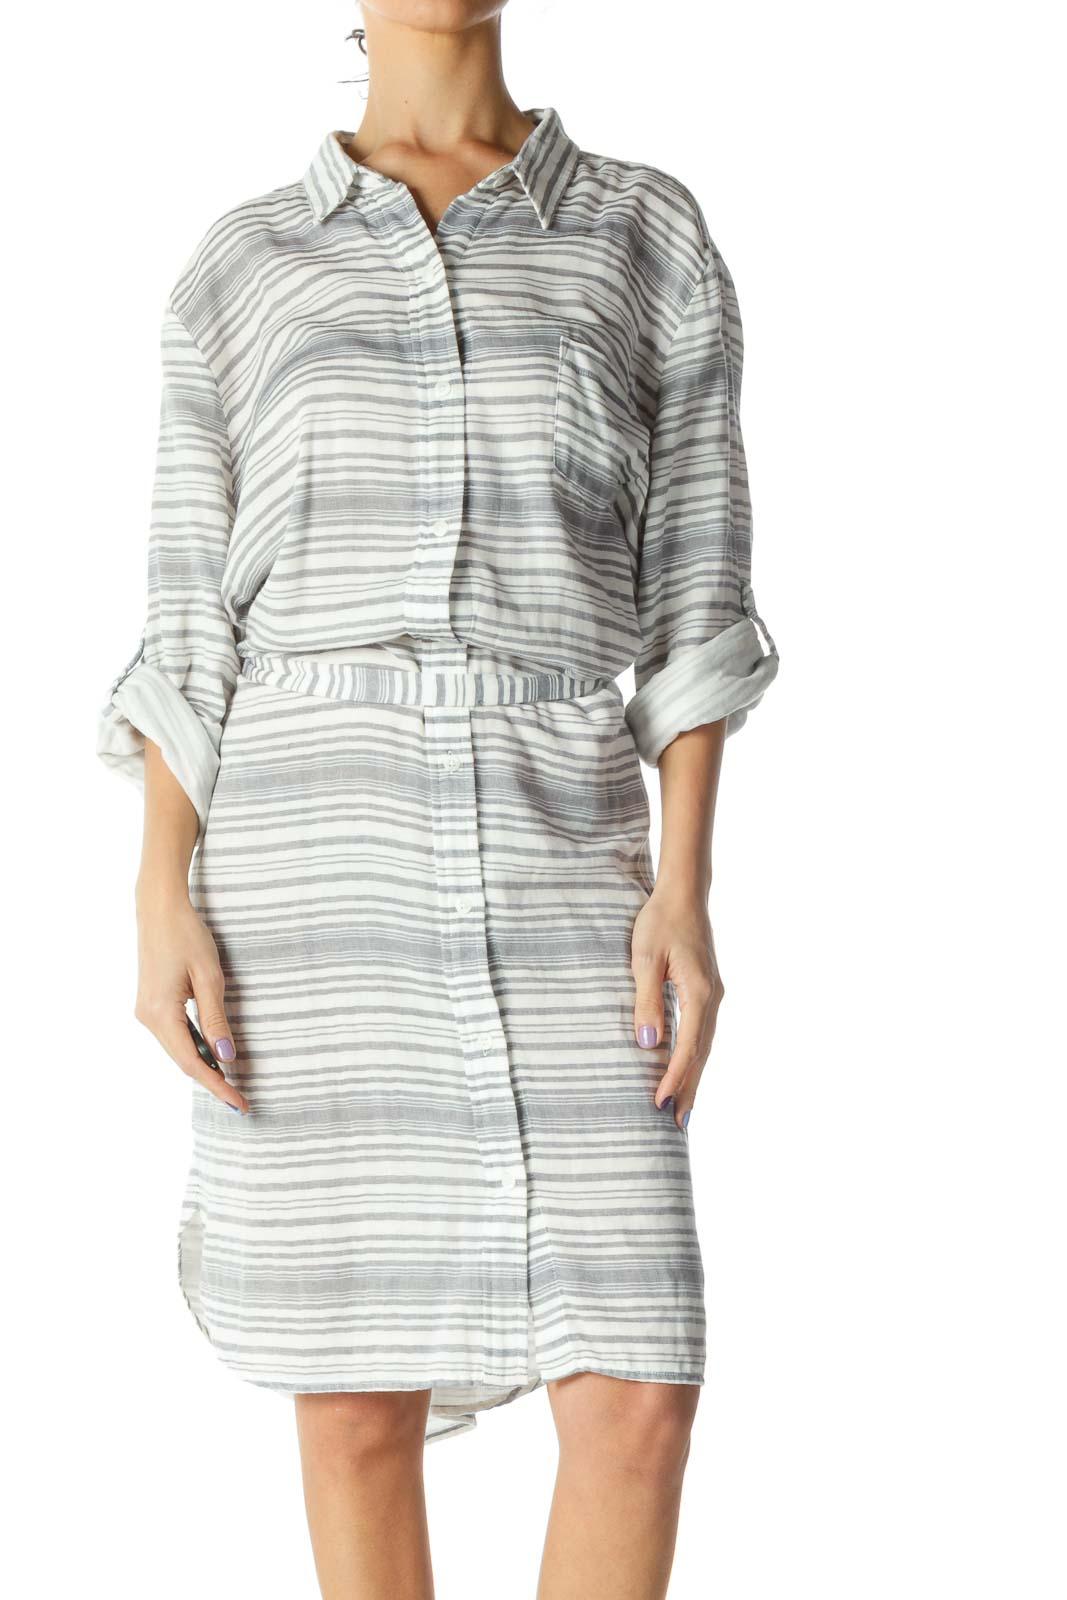 White Blue Striped Beach Dress